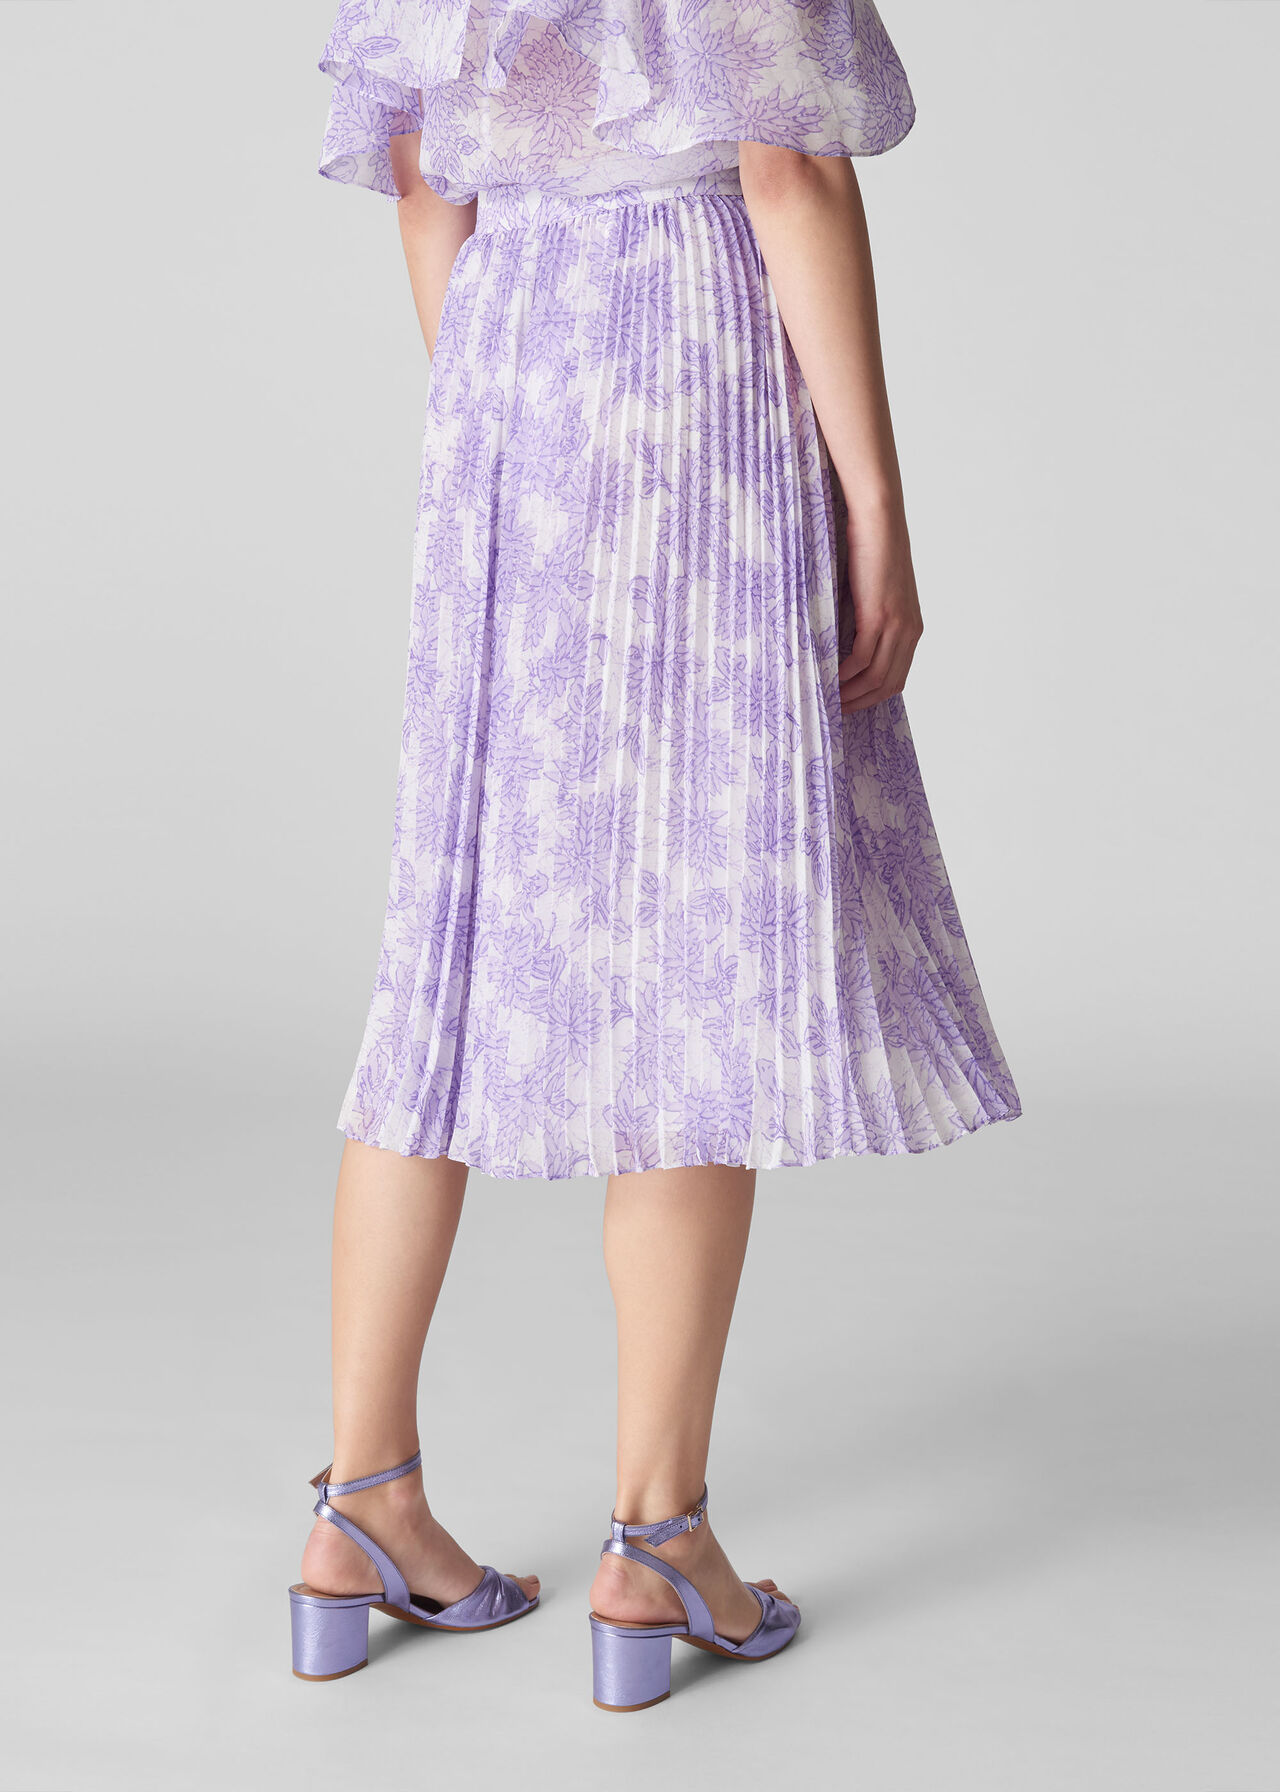 Batik Lily Print Pleated Skirt